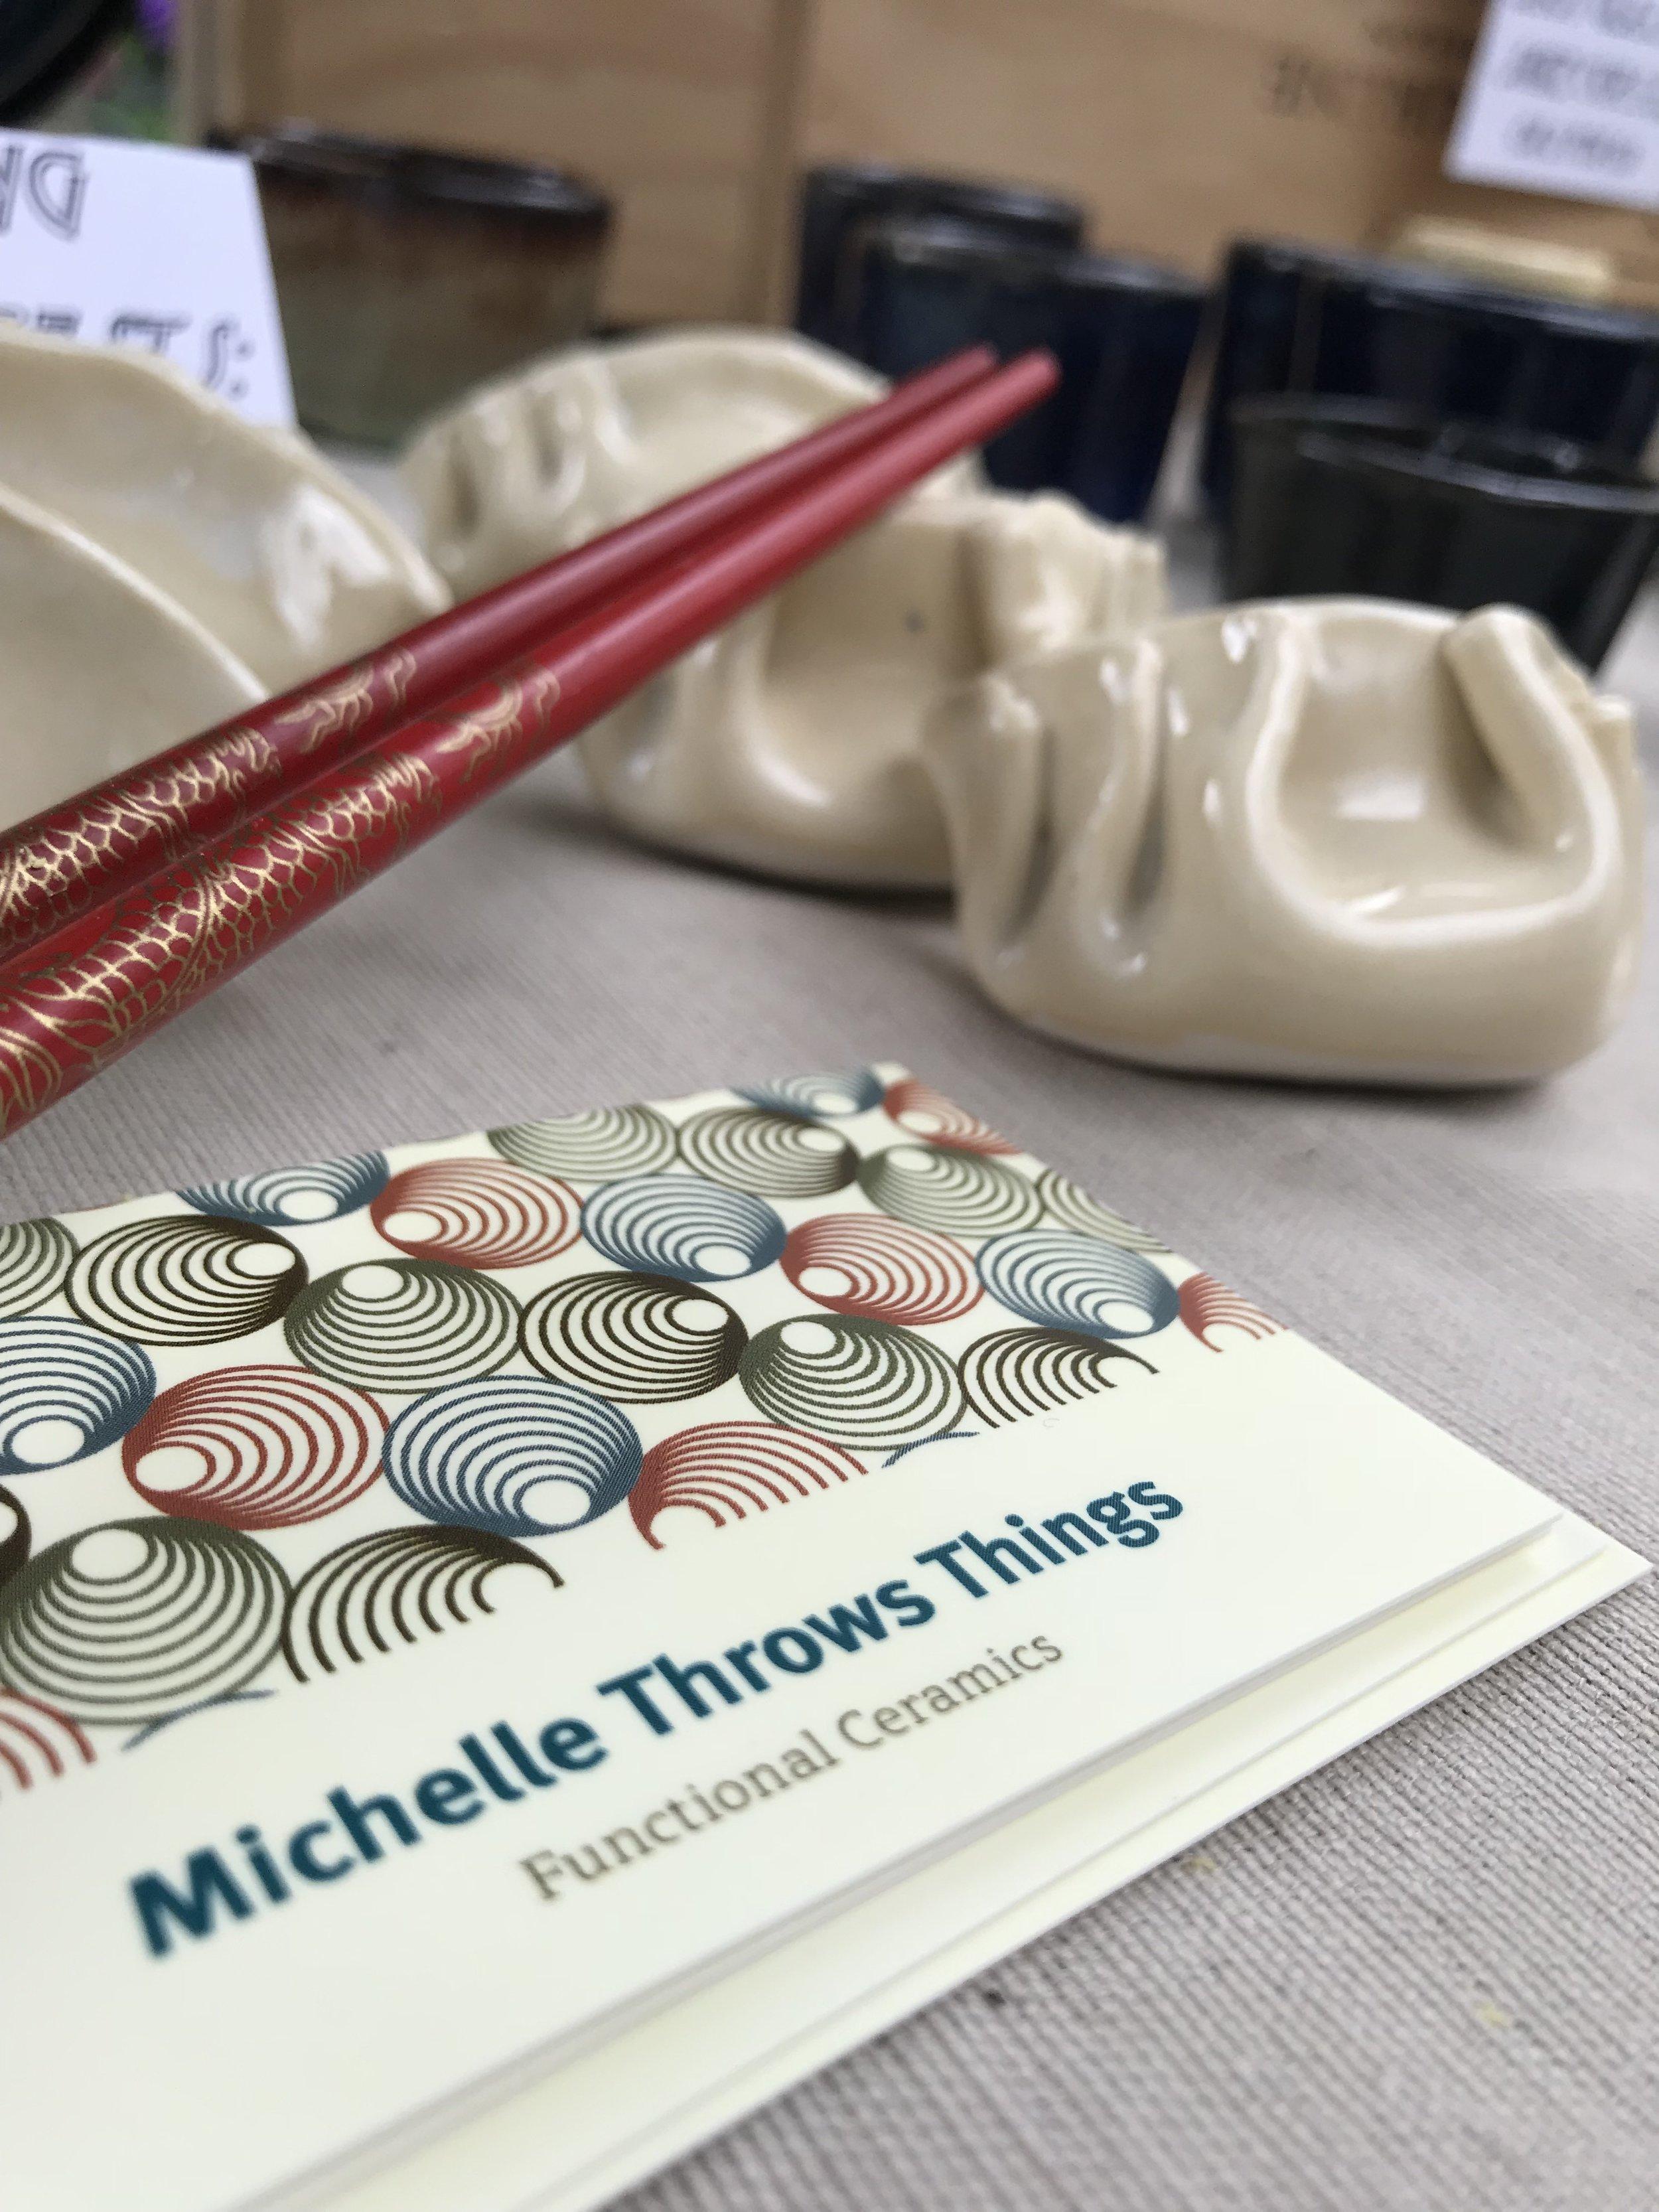 Michelle Throws Things B.JPG